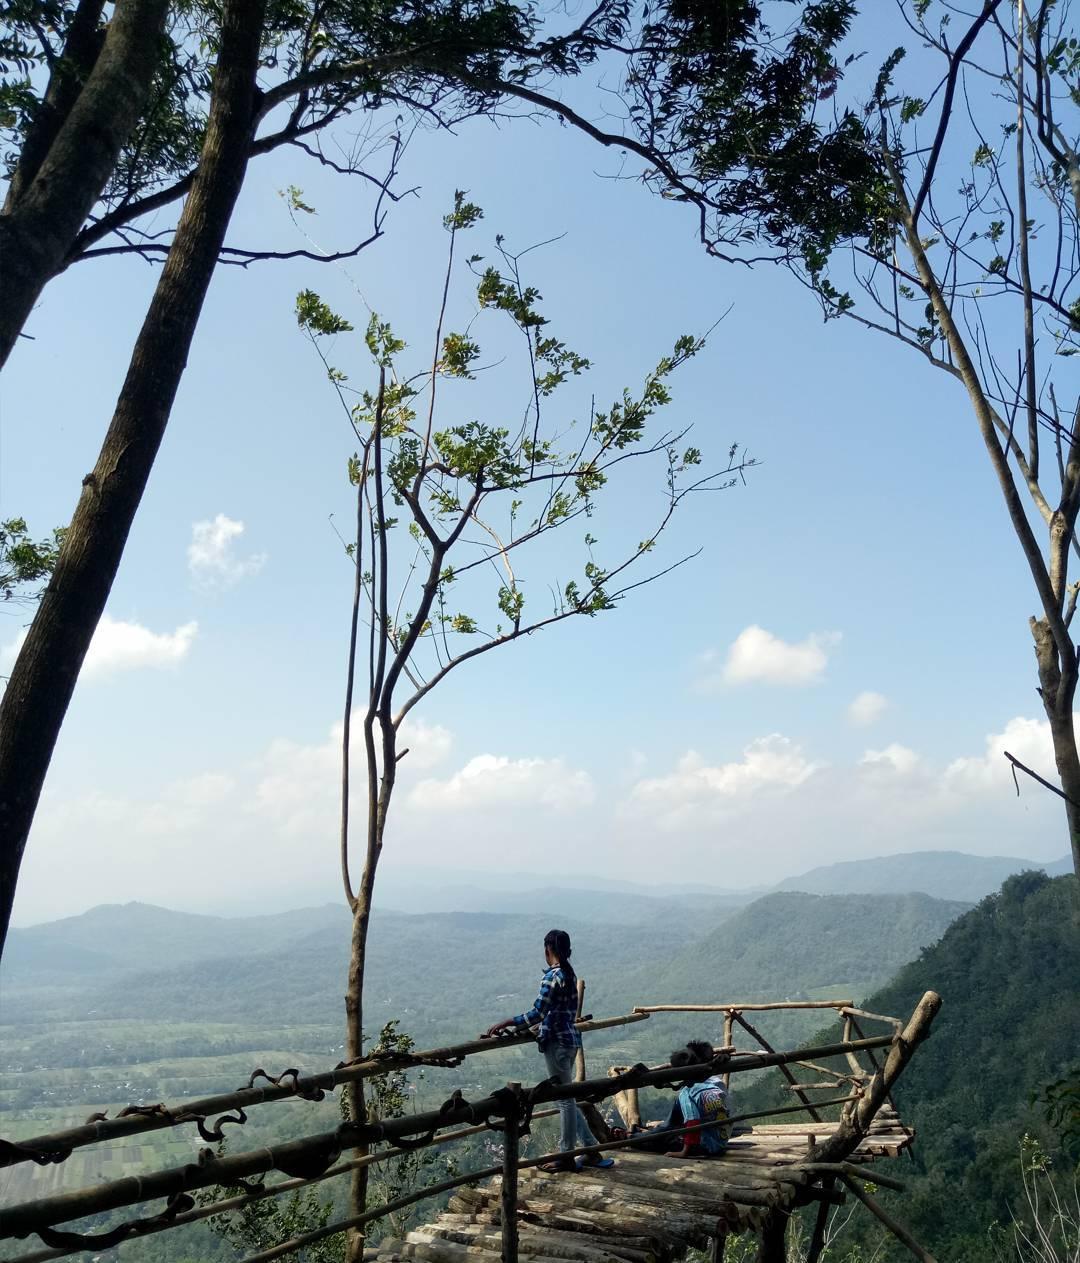 Bukit Srumbung Indah, Bukit Srumbung Indah Yogyakarta, Yogyakarta, Dolan Dolen, Dolaners Bukit Srumbung Indah via bukit srumbung - Dolan Dolen